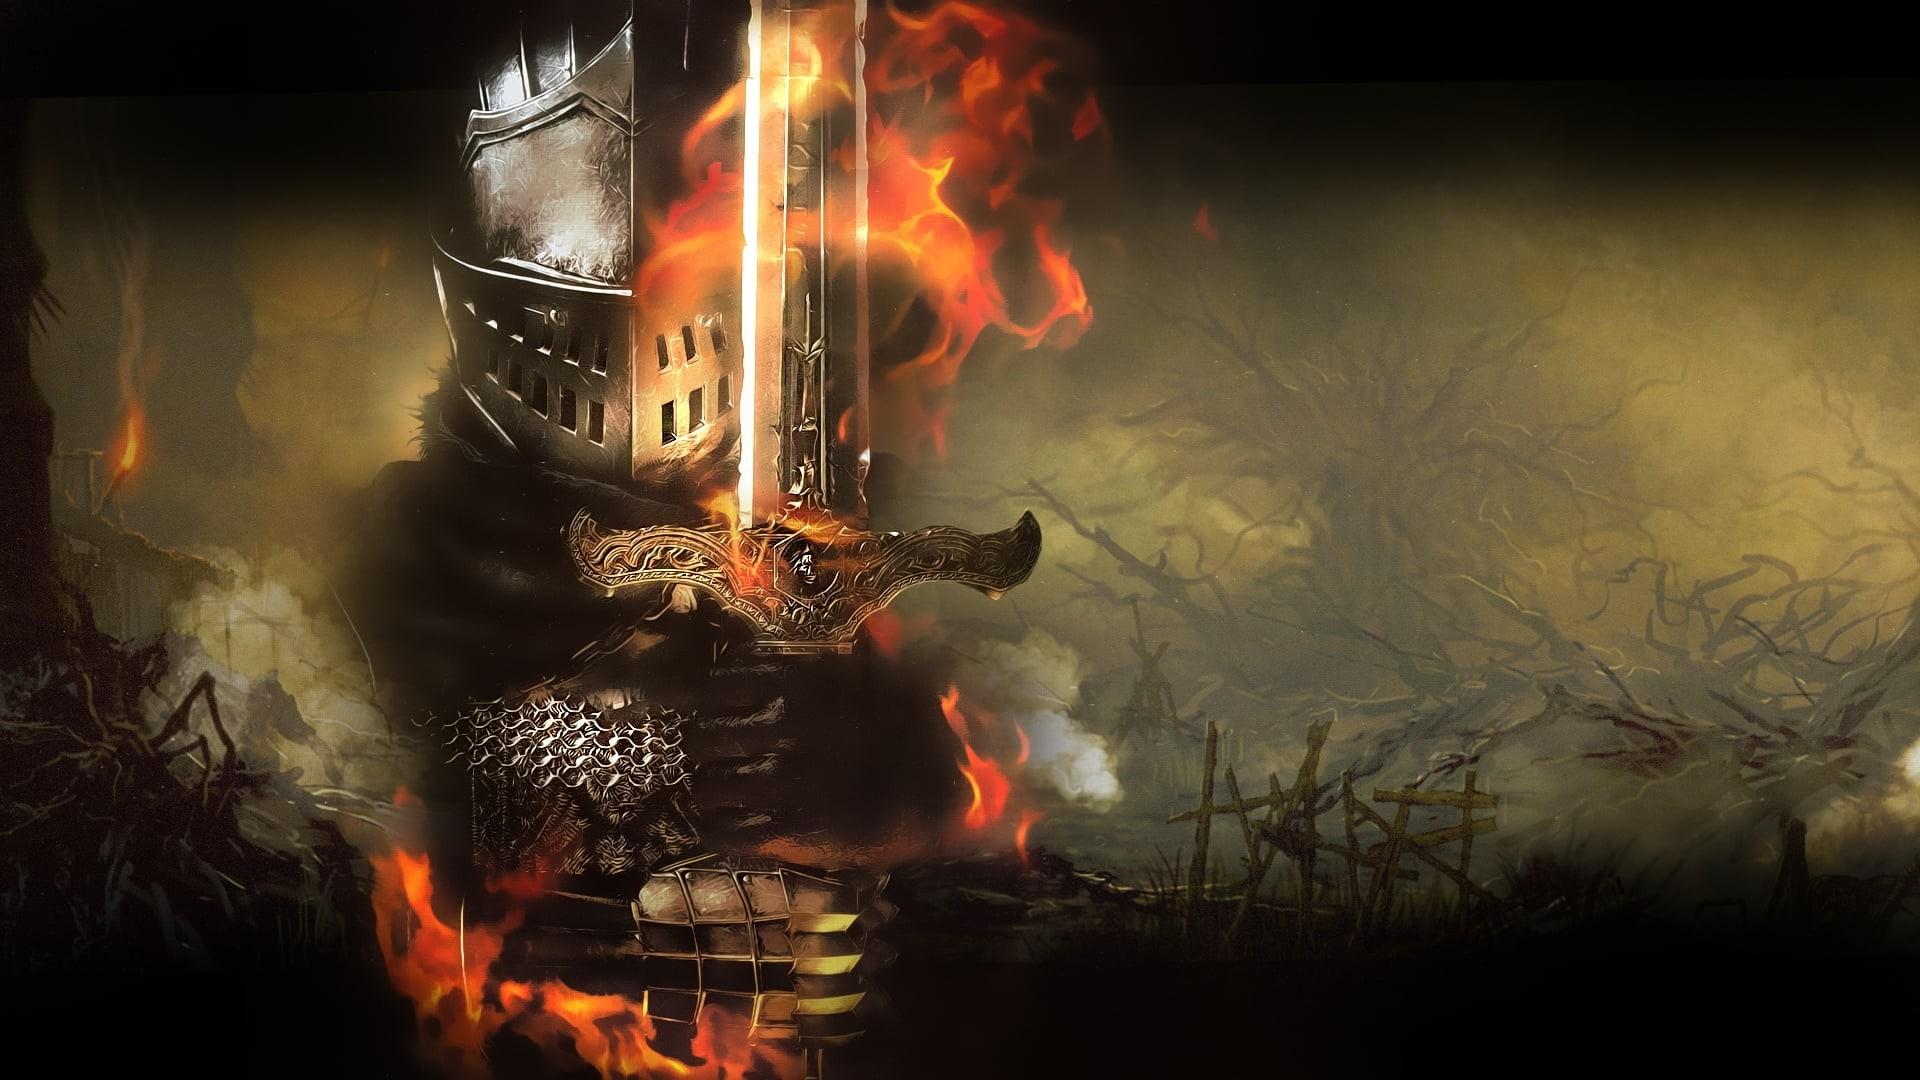 Knight Artorias – Dark Souls HD Formidable Wallpaper Free | Adorable  Wallpapers | Pinterest | Dark souls, Knight and Wallpaper